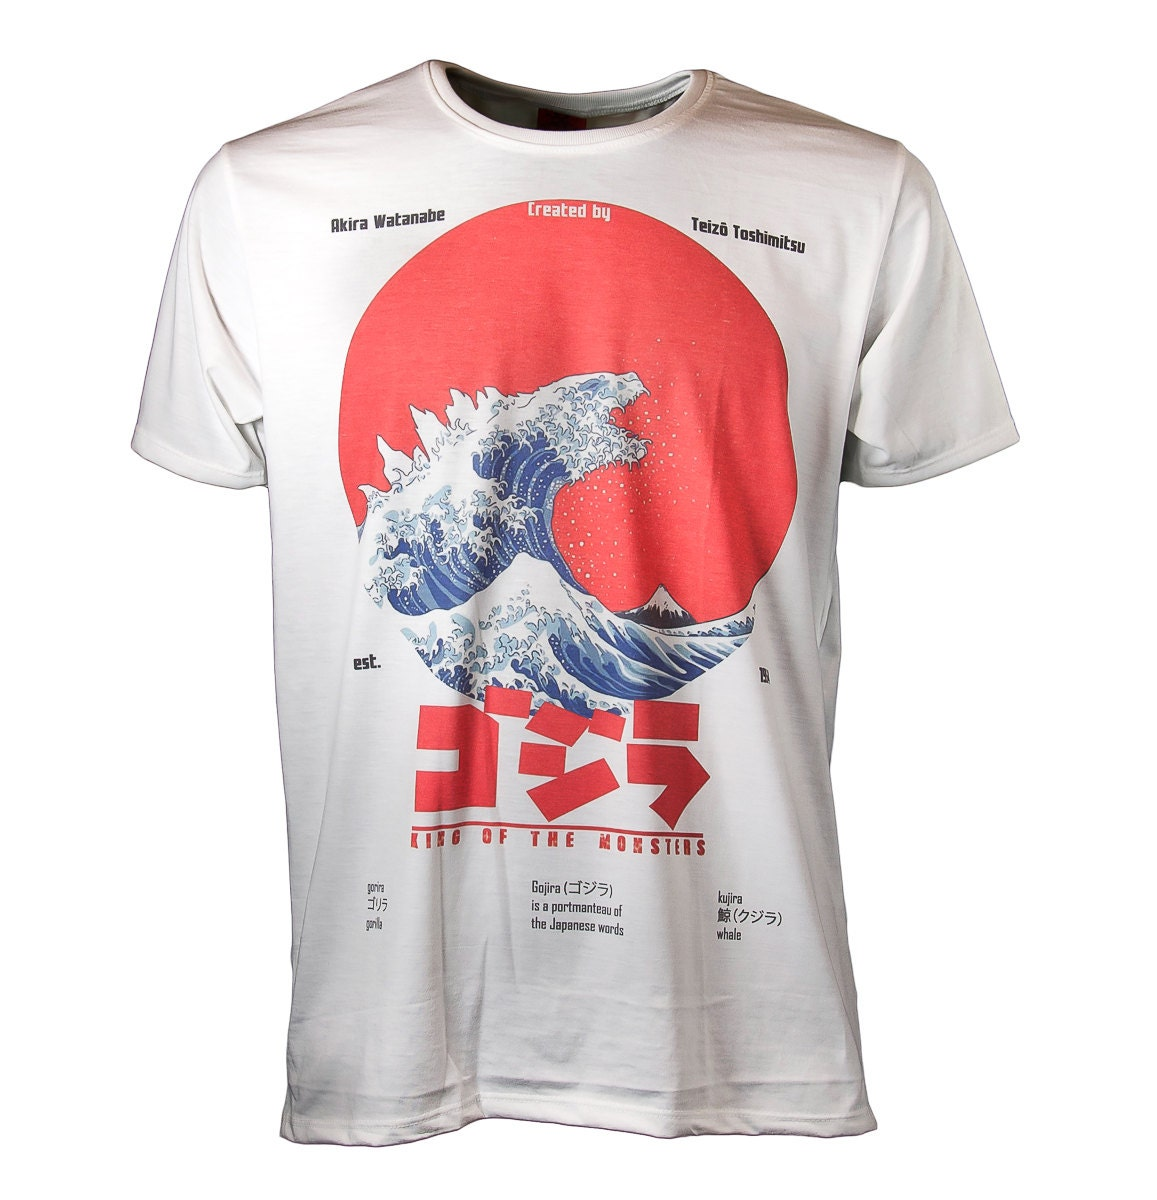 godzilla tshirt mens t shirt printed shirt by bkkstore